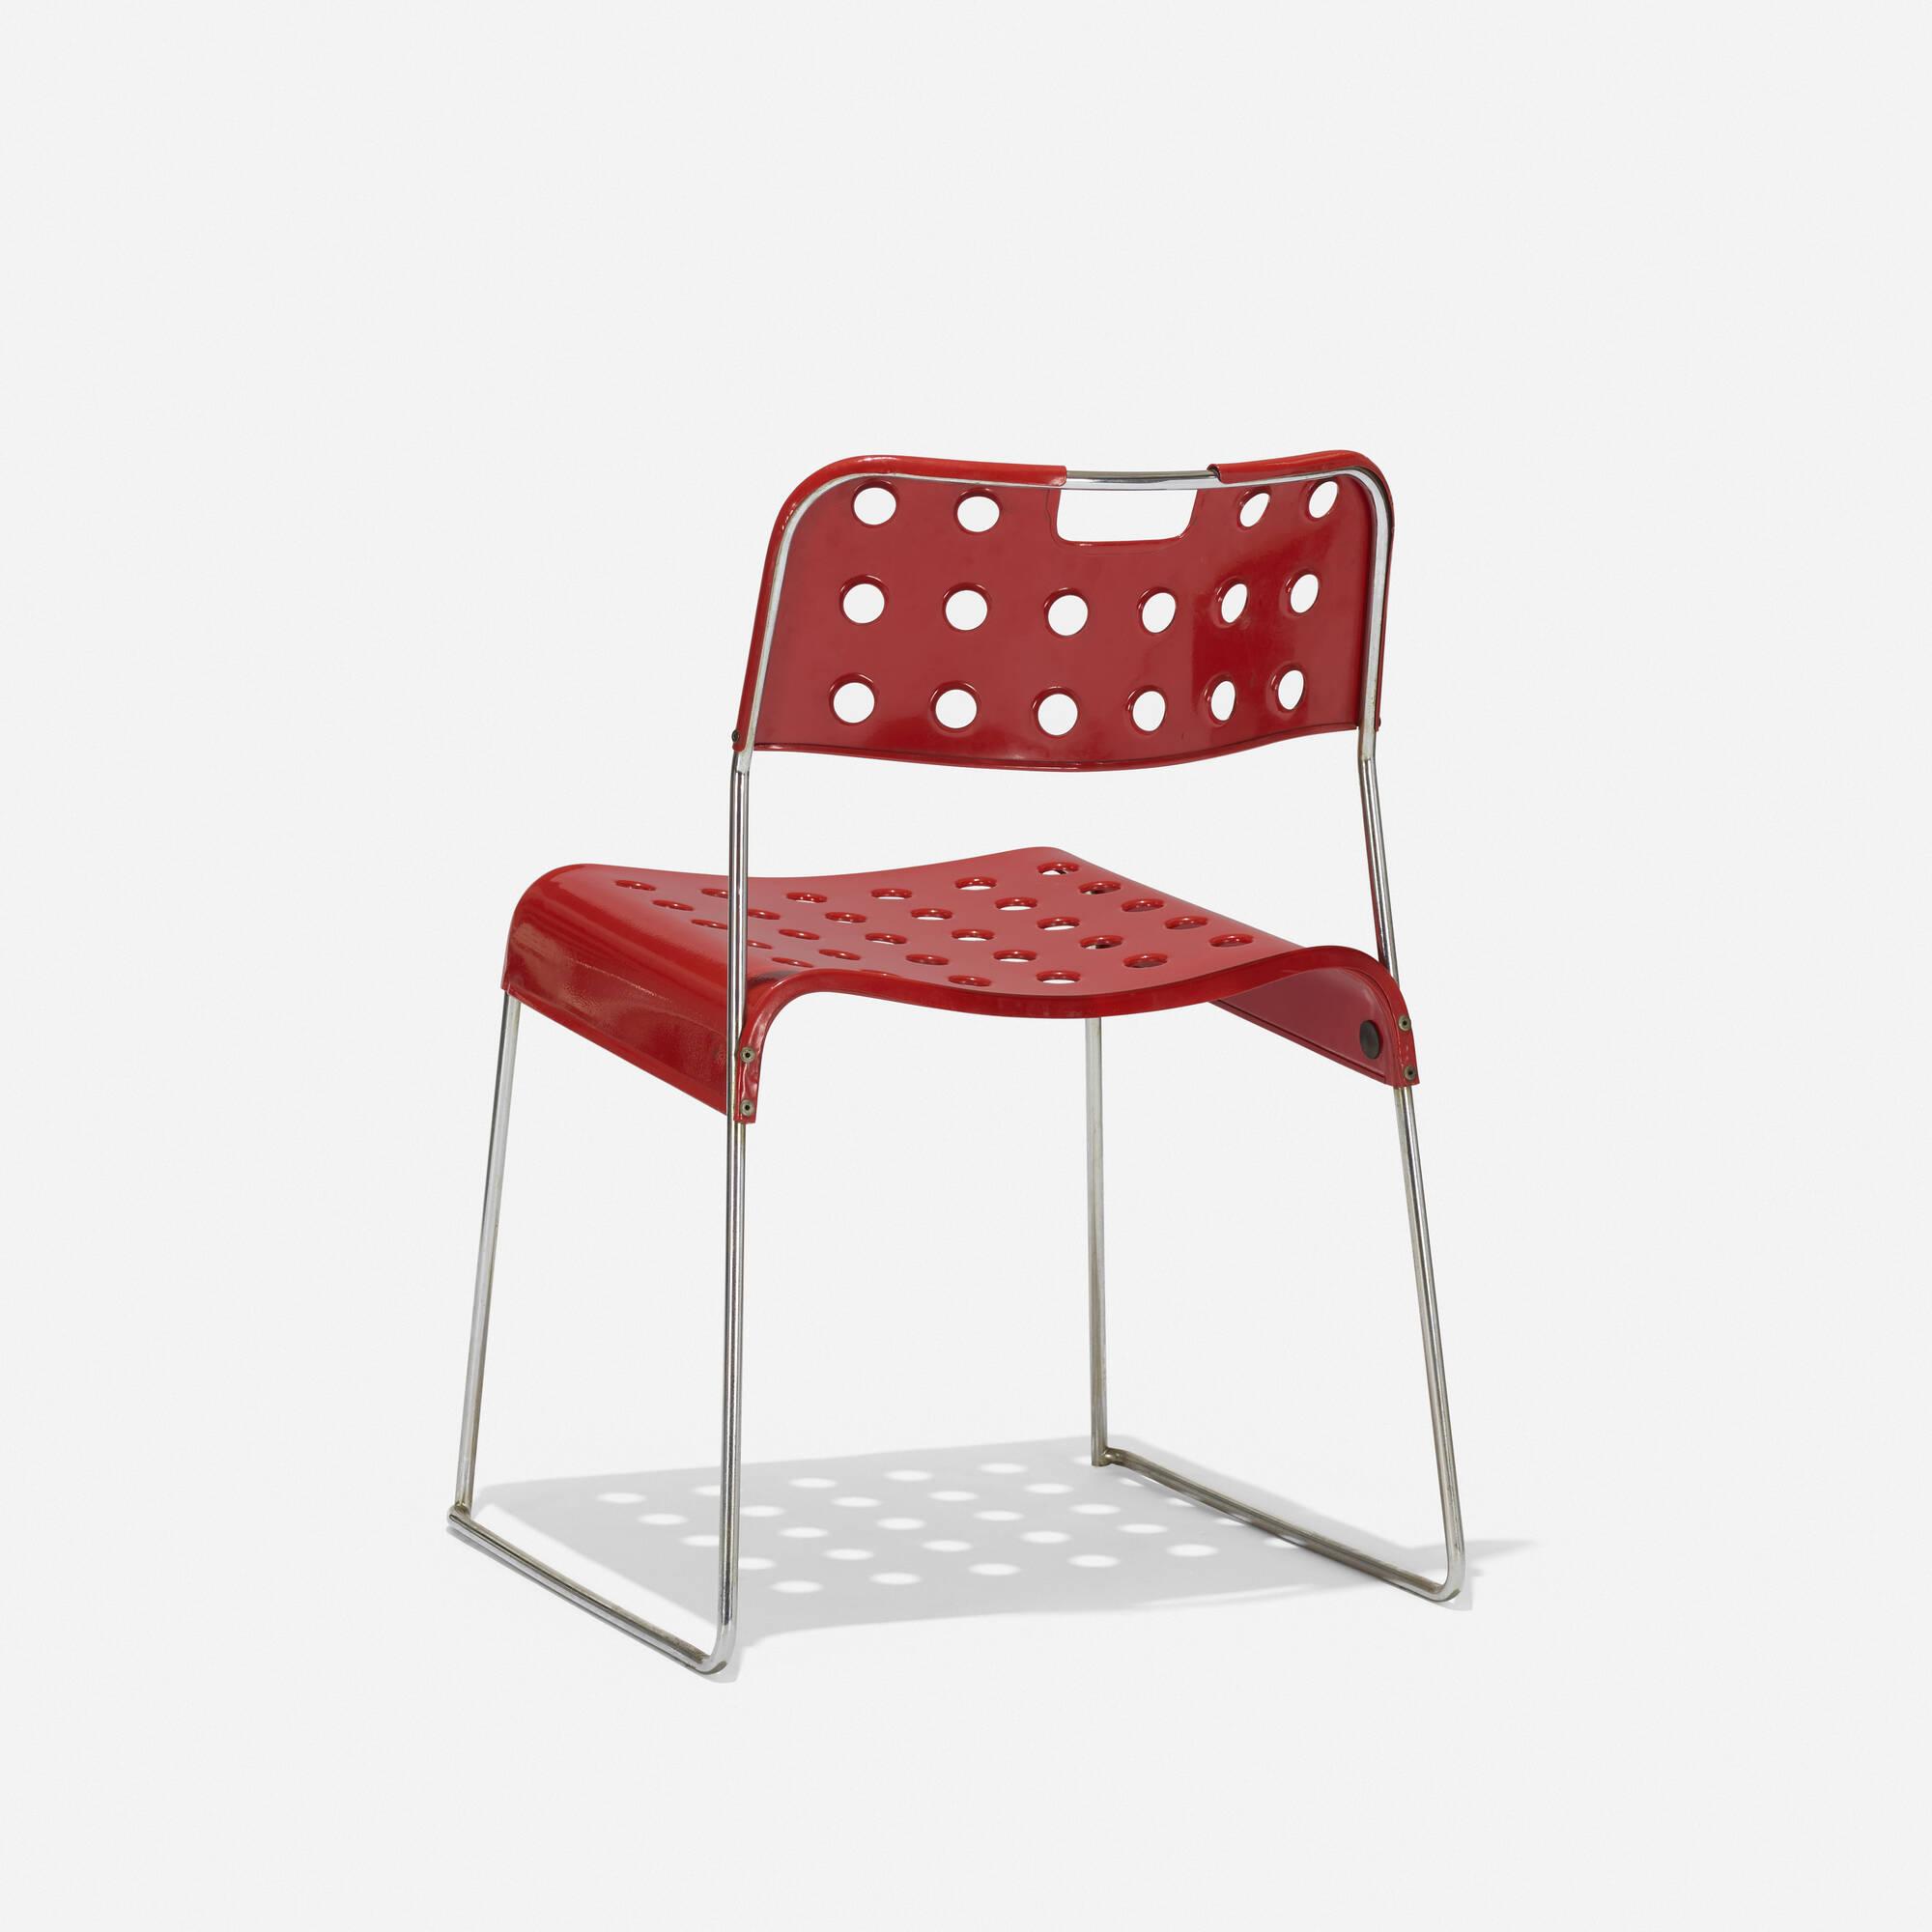 408: Rodney Kinsmen / Omkstack chair (1 of 3)